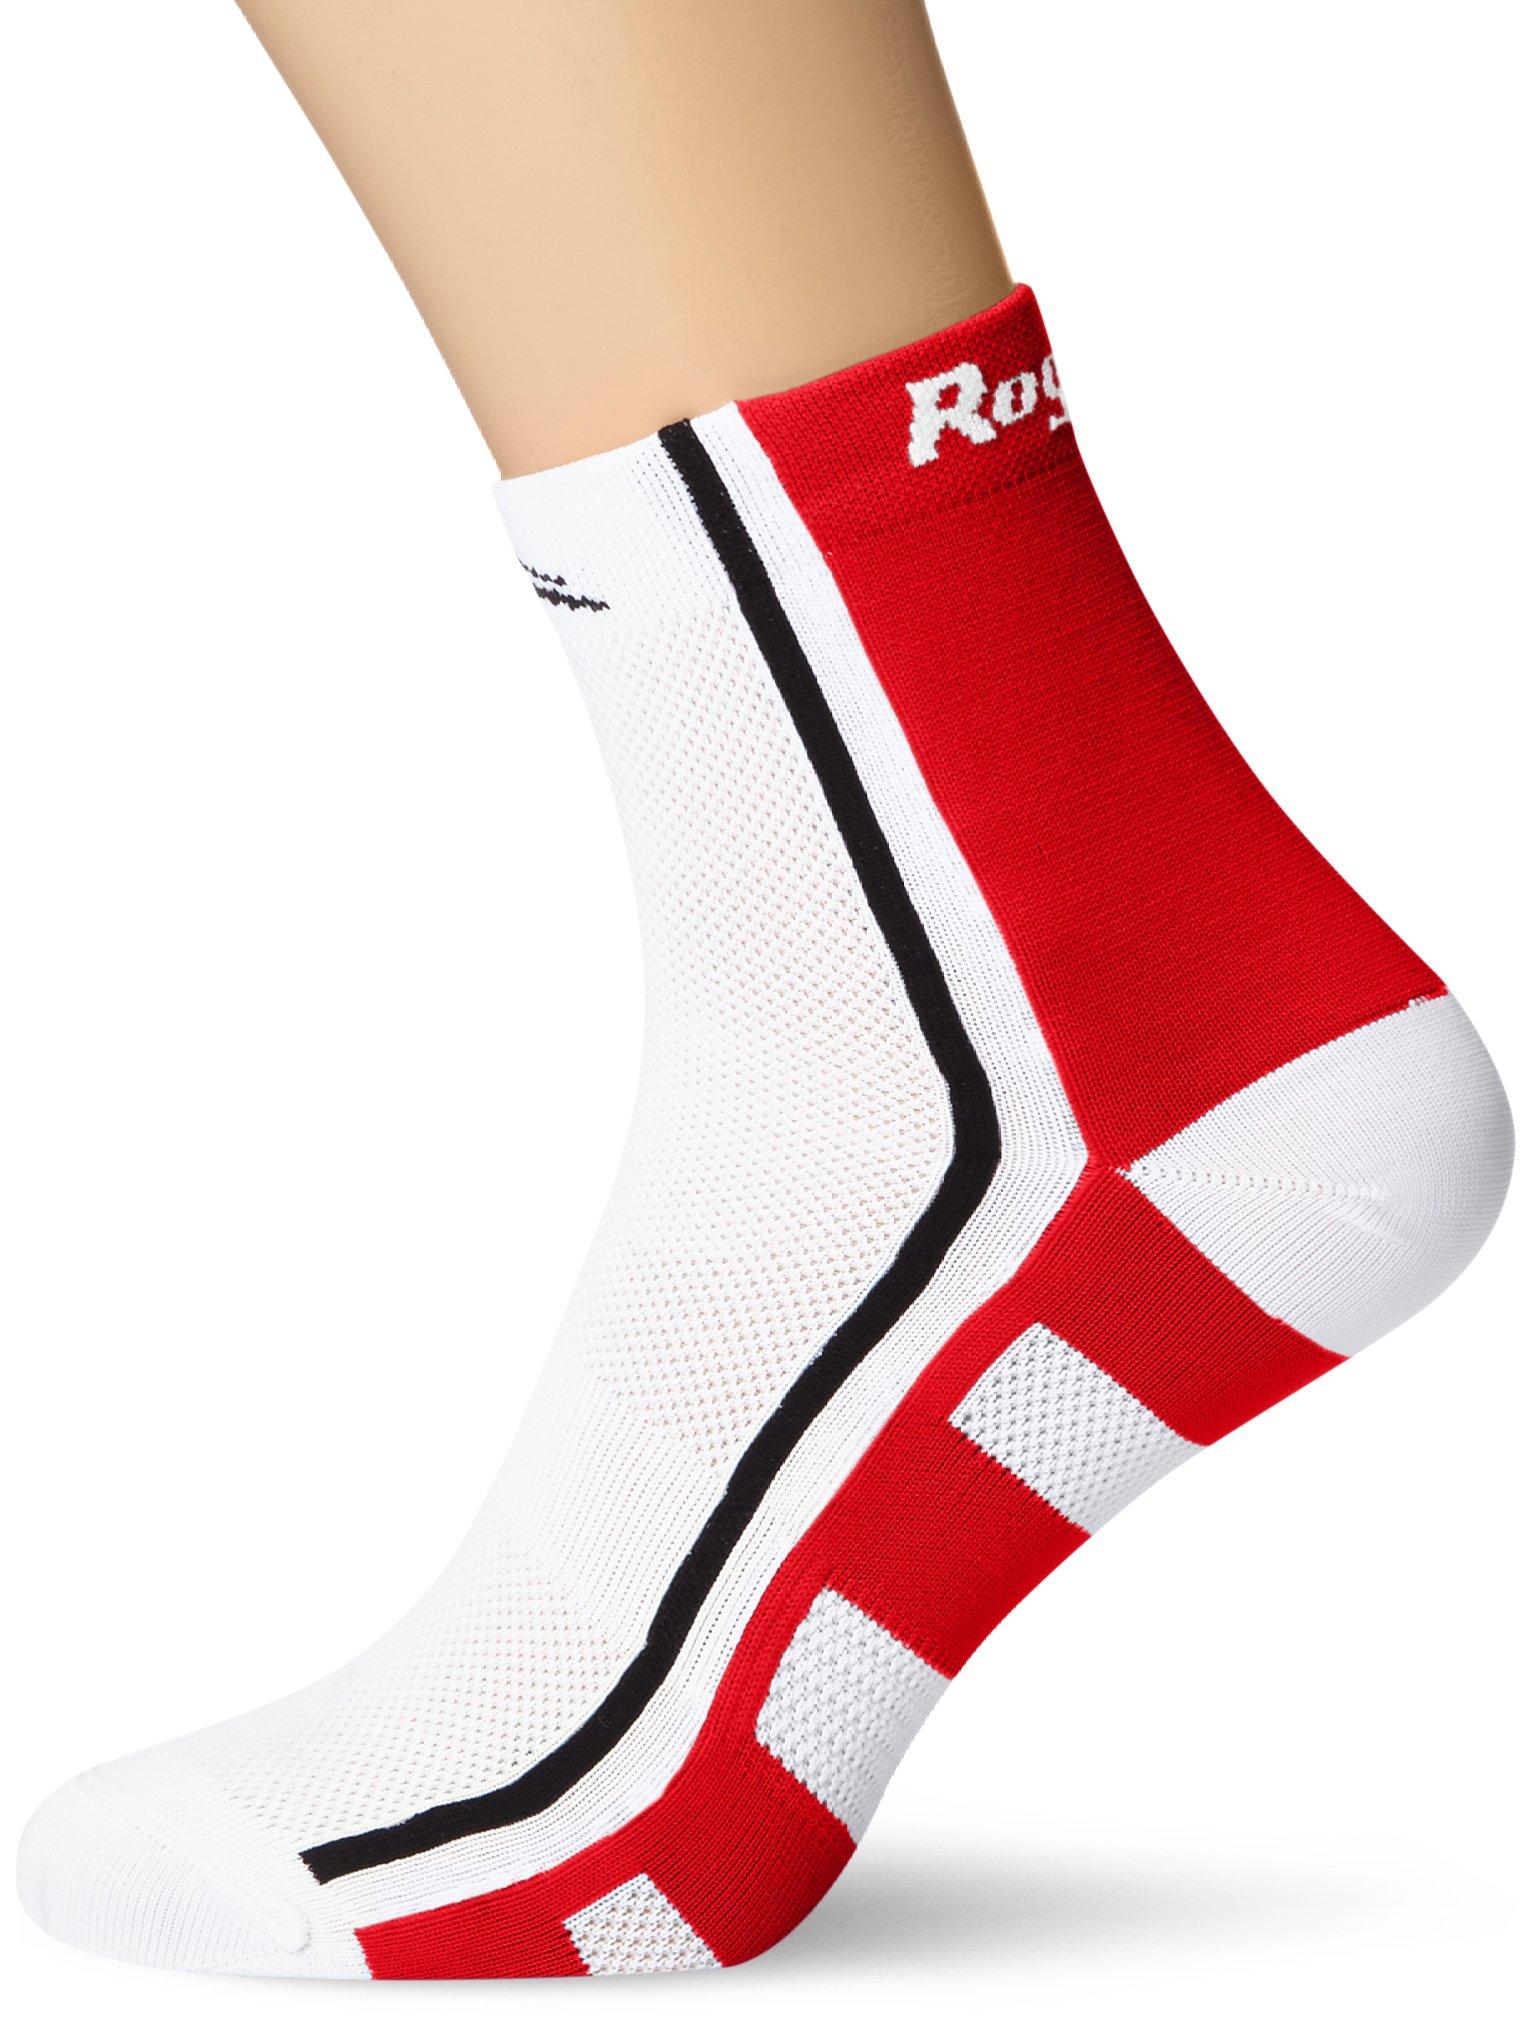 Rogelli Herren Radsportsocken RCS-04, White/Red/Black, 44/47